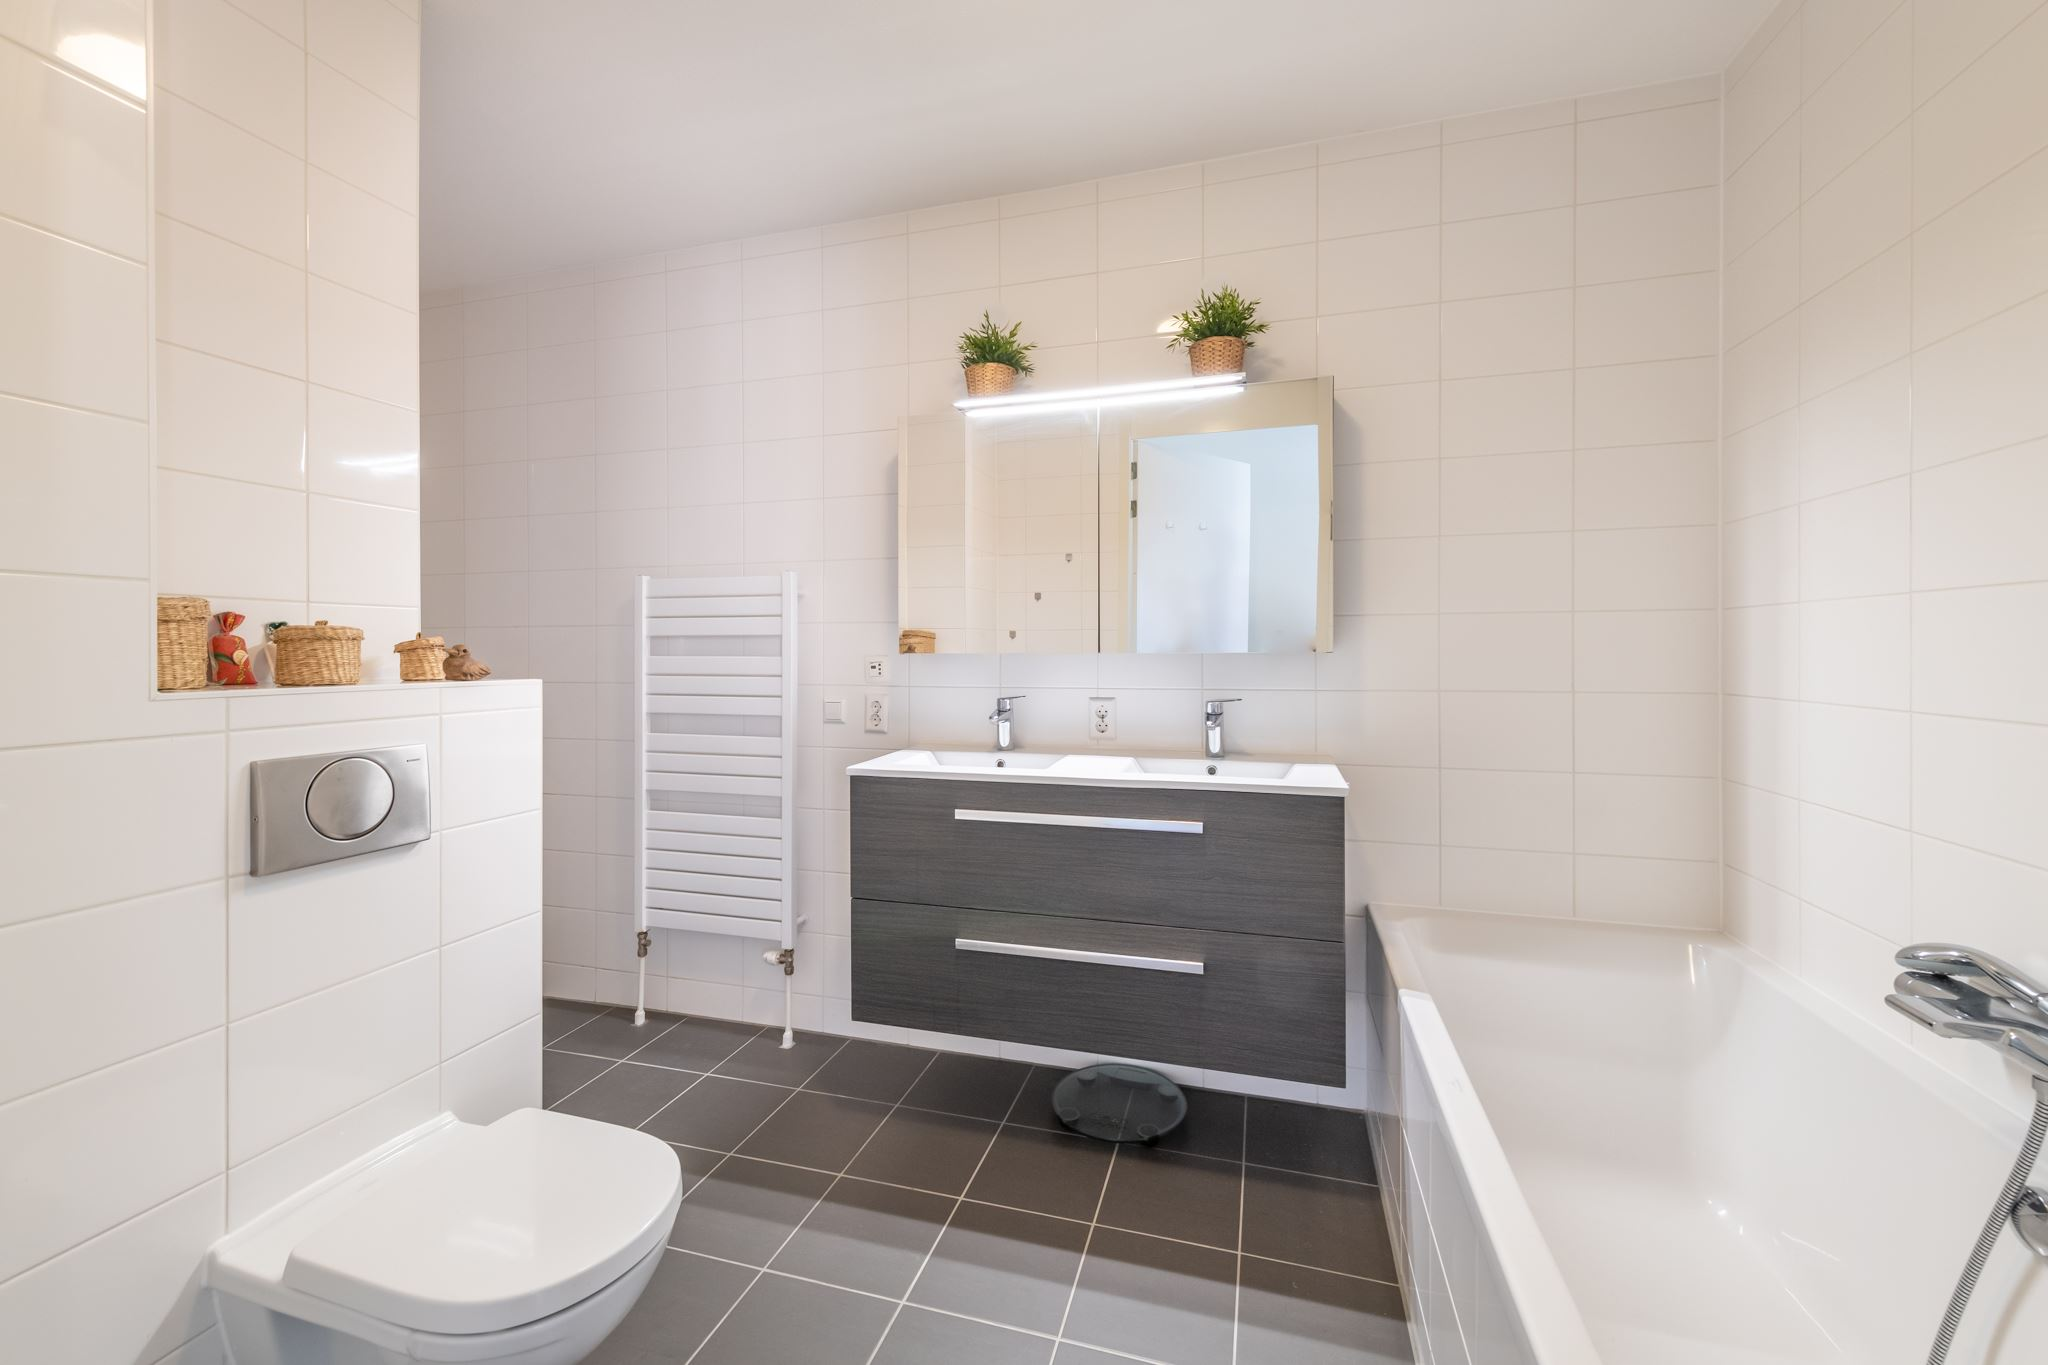 Apartment for sale oranje vrijstaatkade 10 1093 ks for Funda amsterdam watergraafsmeer